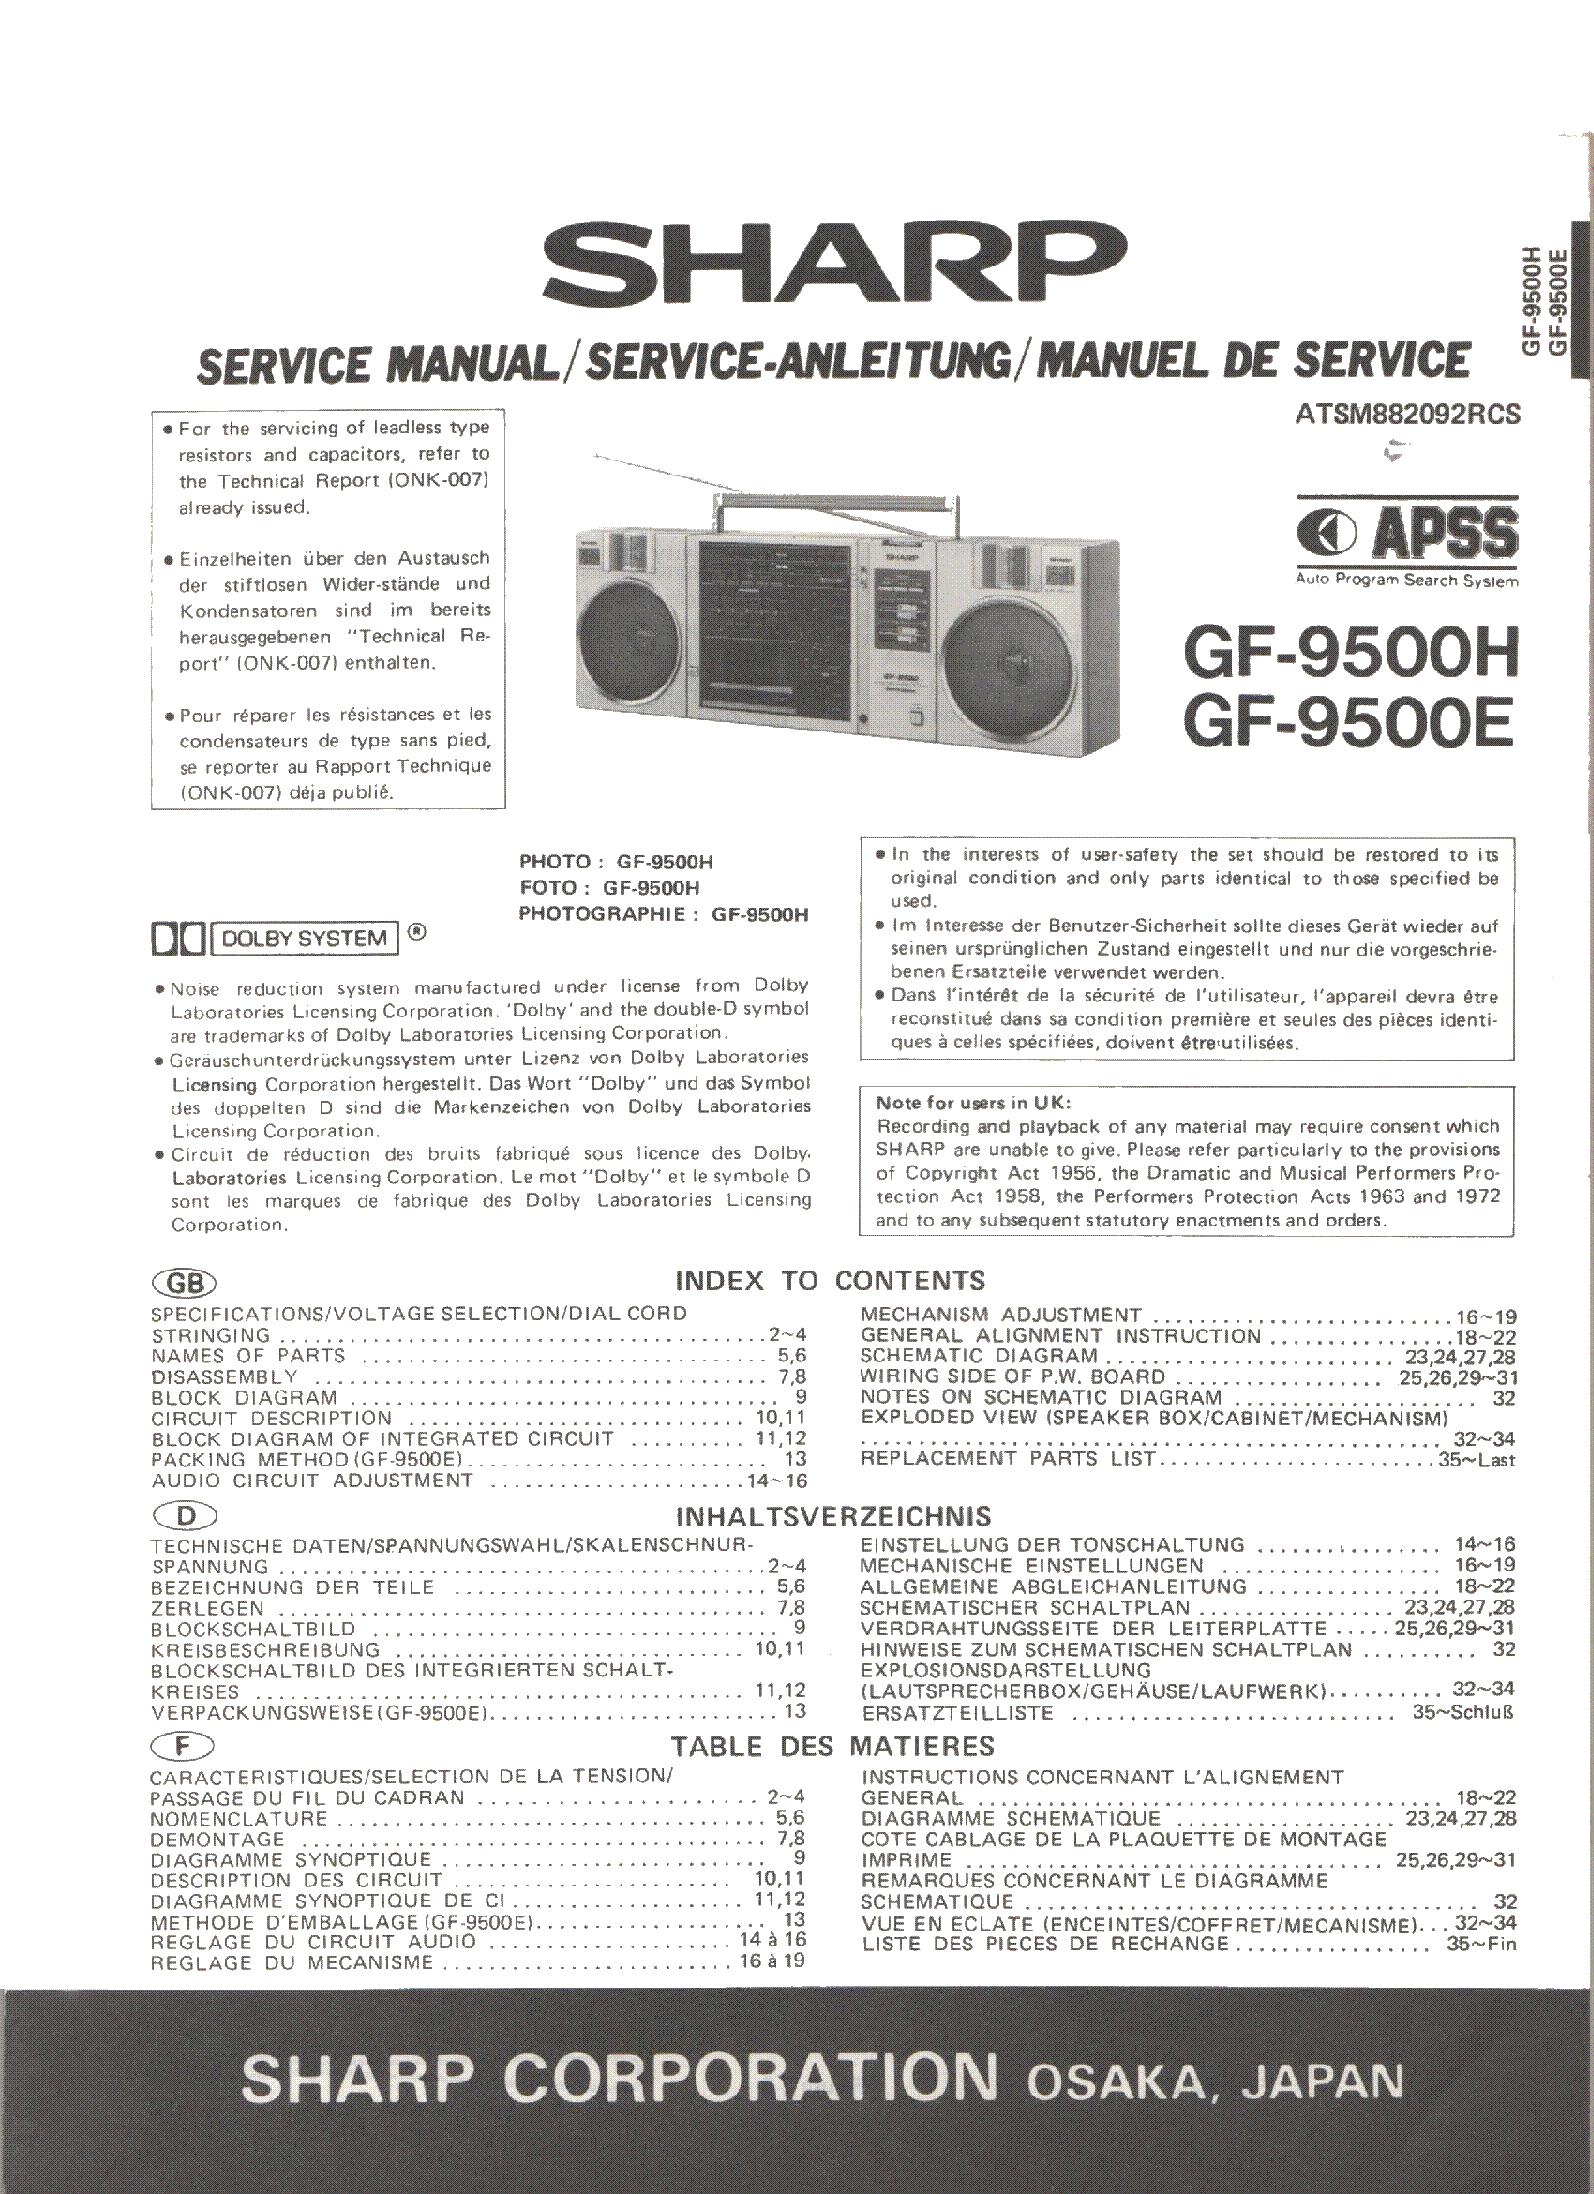 SHARP GF-9500H GF-9500E service manual (1st page)